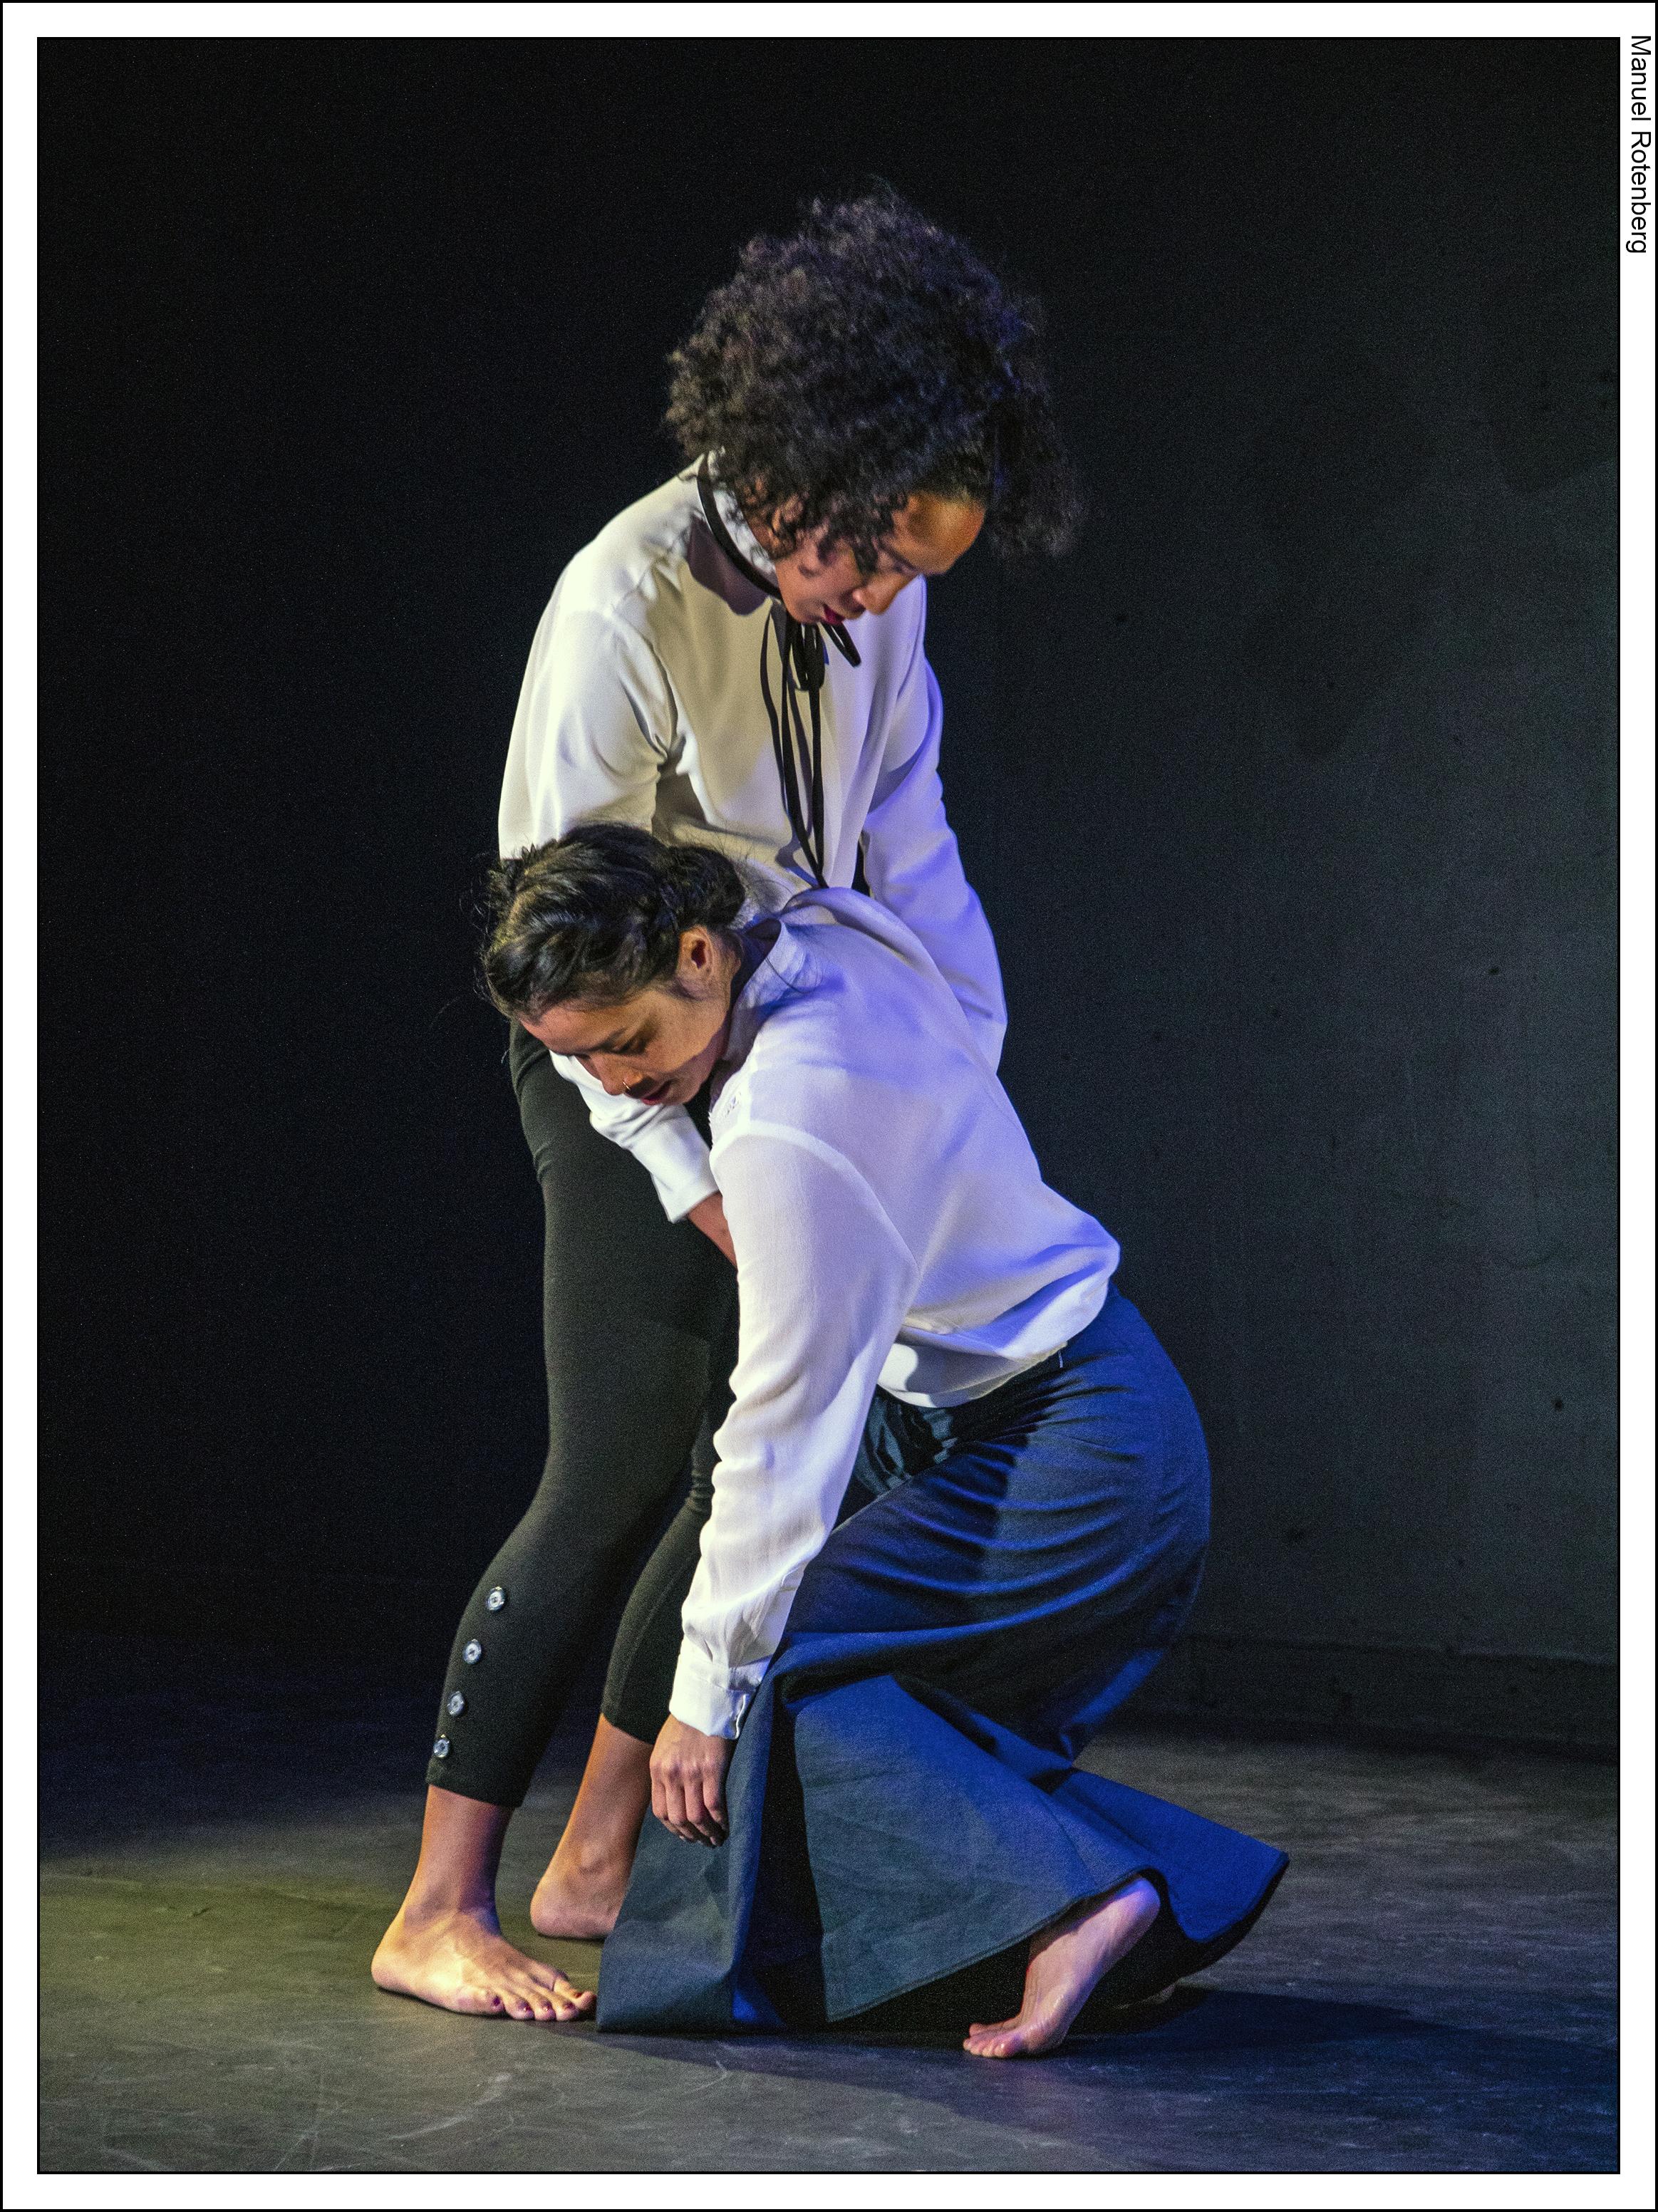 LITVAKdance. Photo credit Manuel Rotenberg